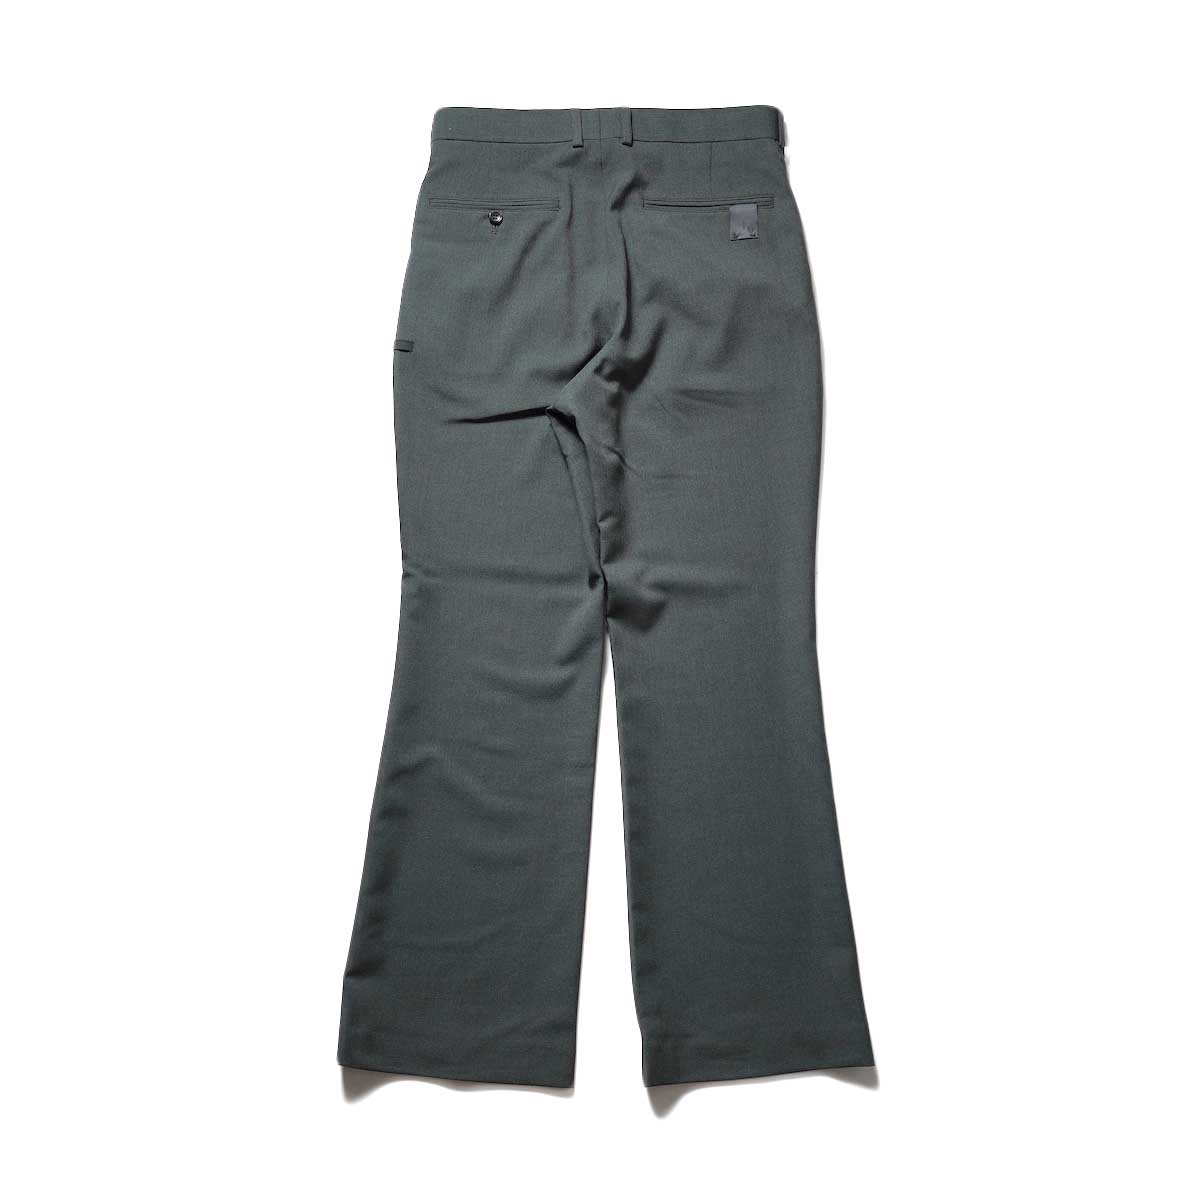 N.HOOLYWOOD / 2212-PT21-008 Flair Slacks (Charcoal)背面